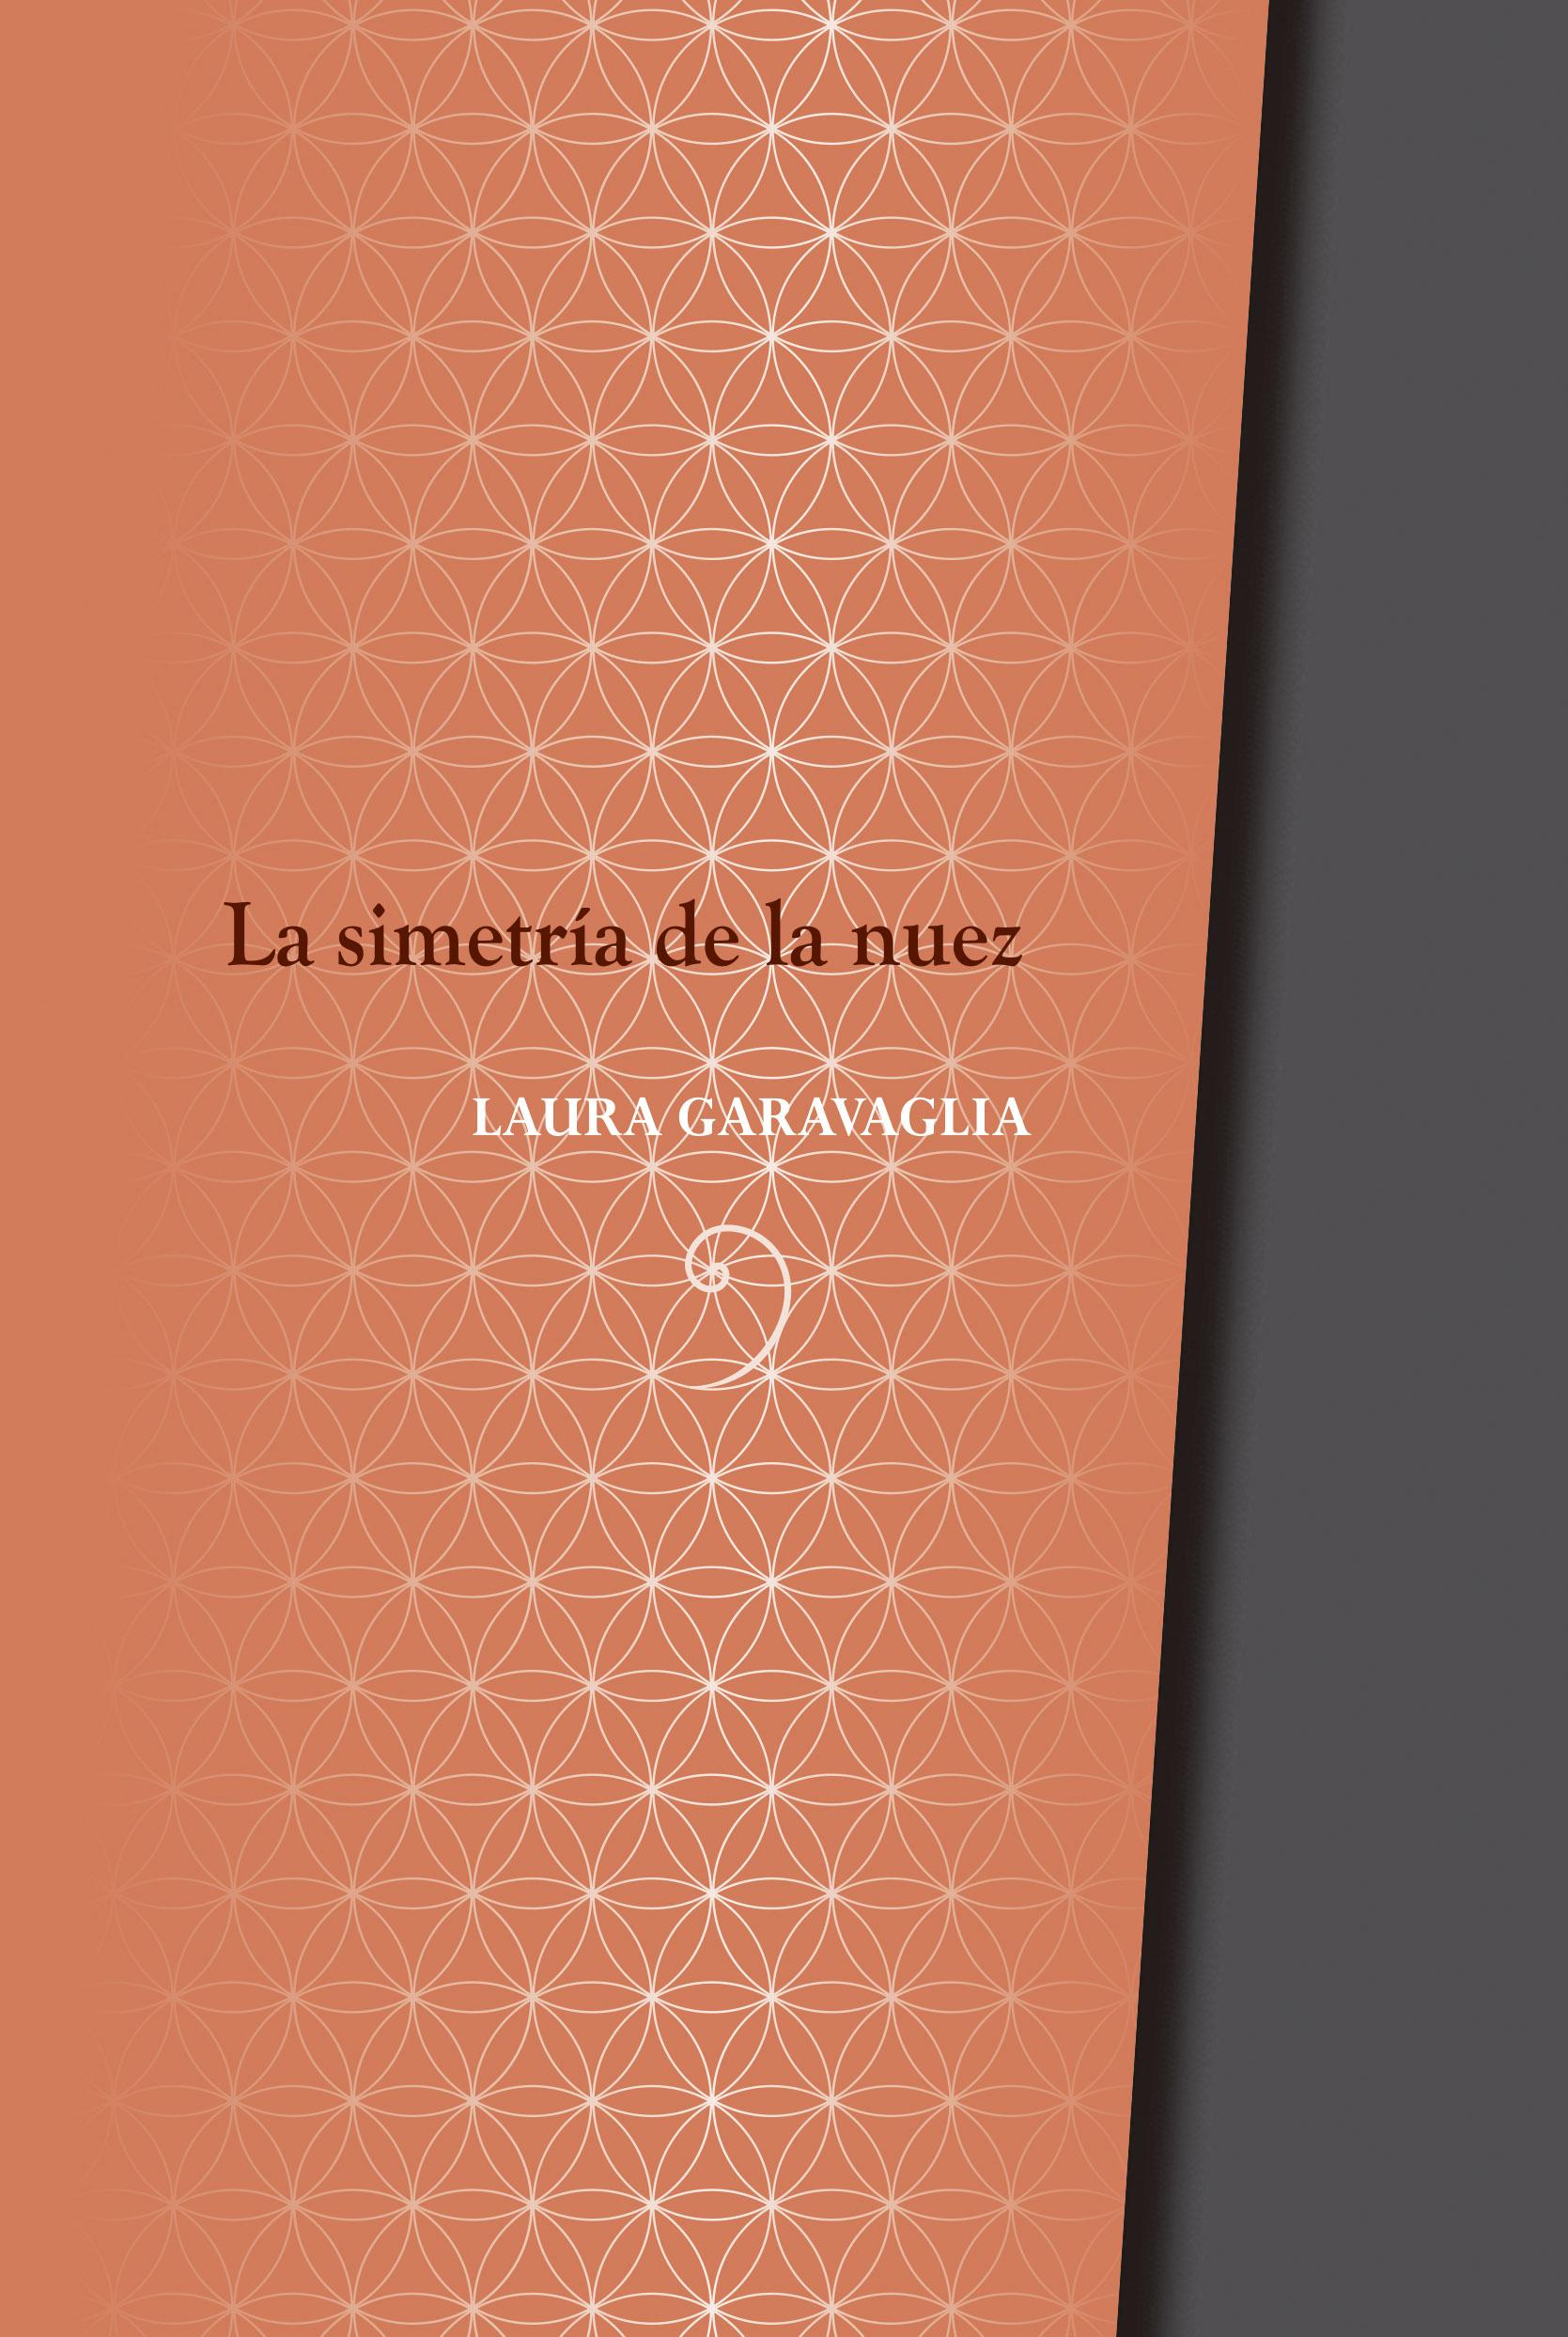 La simetria de la nuez - Laura Garavaglia | La Garúa Poesía